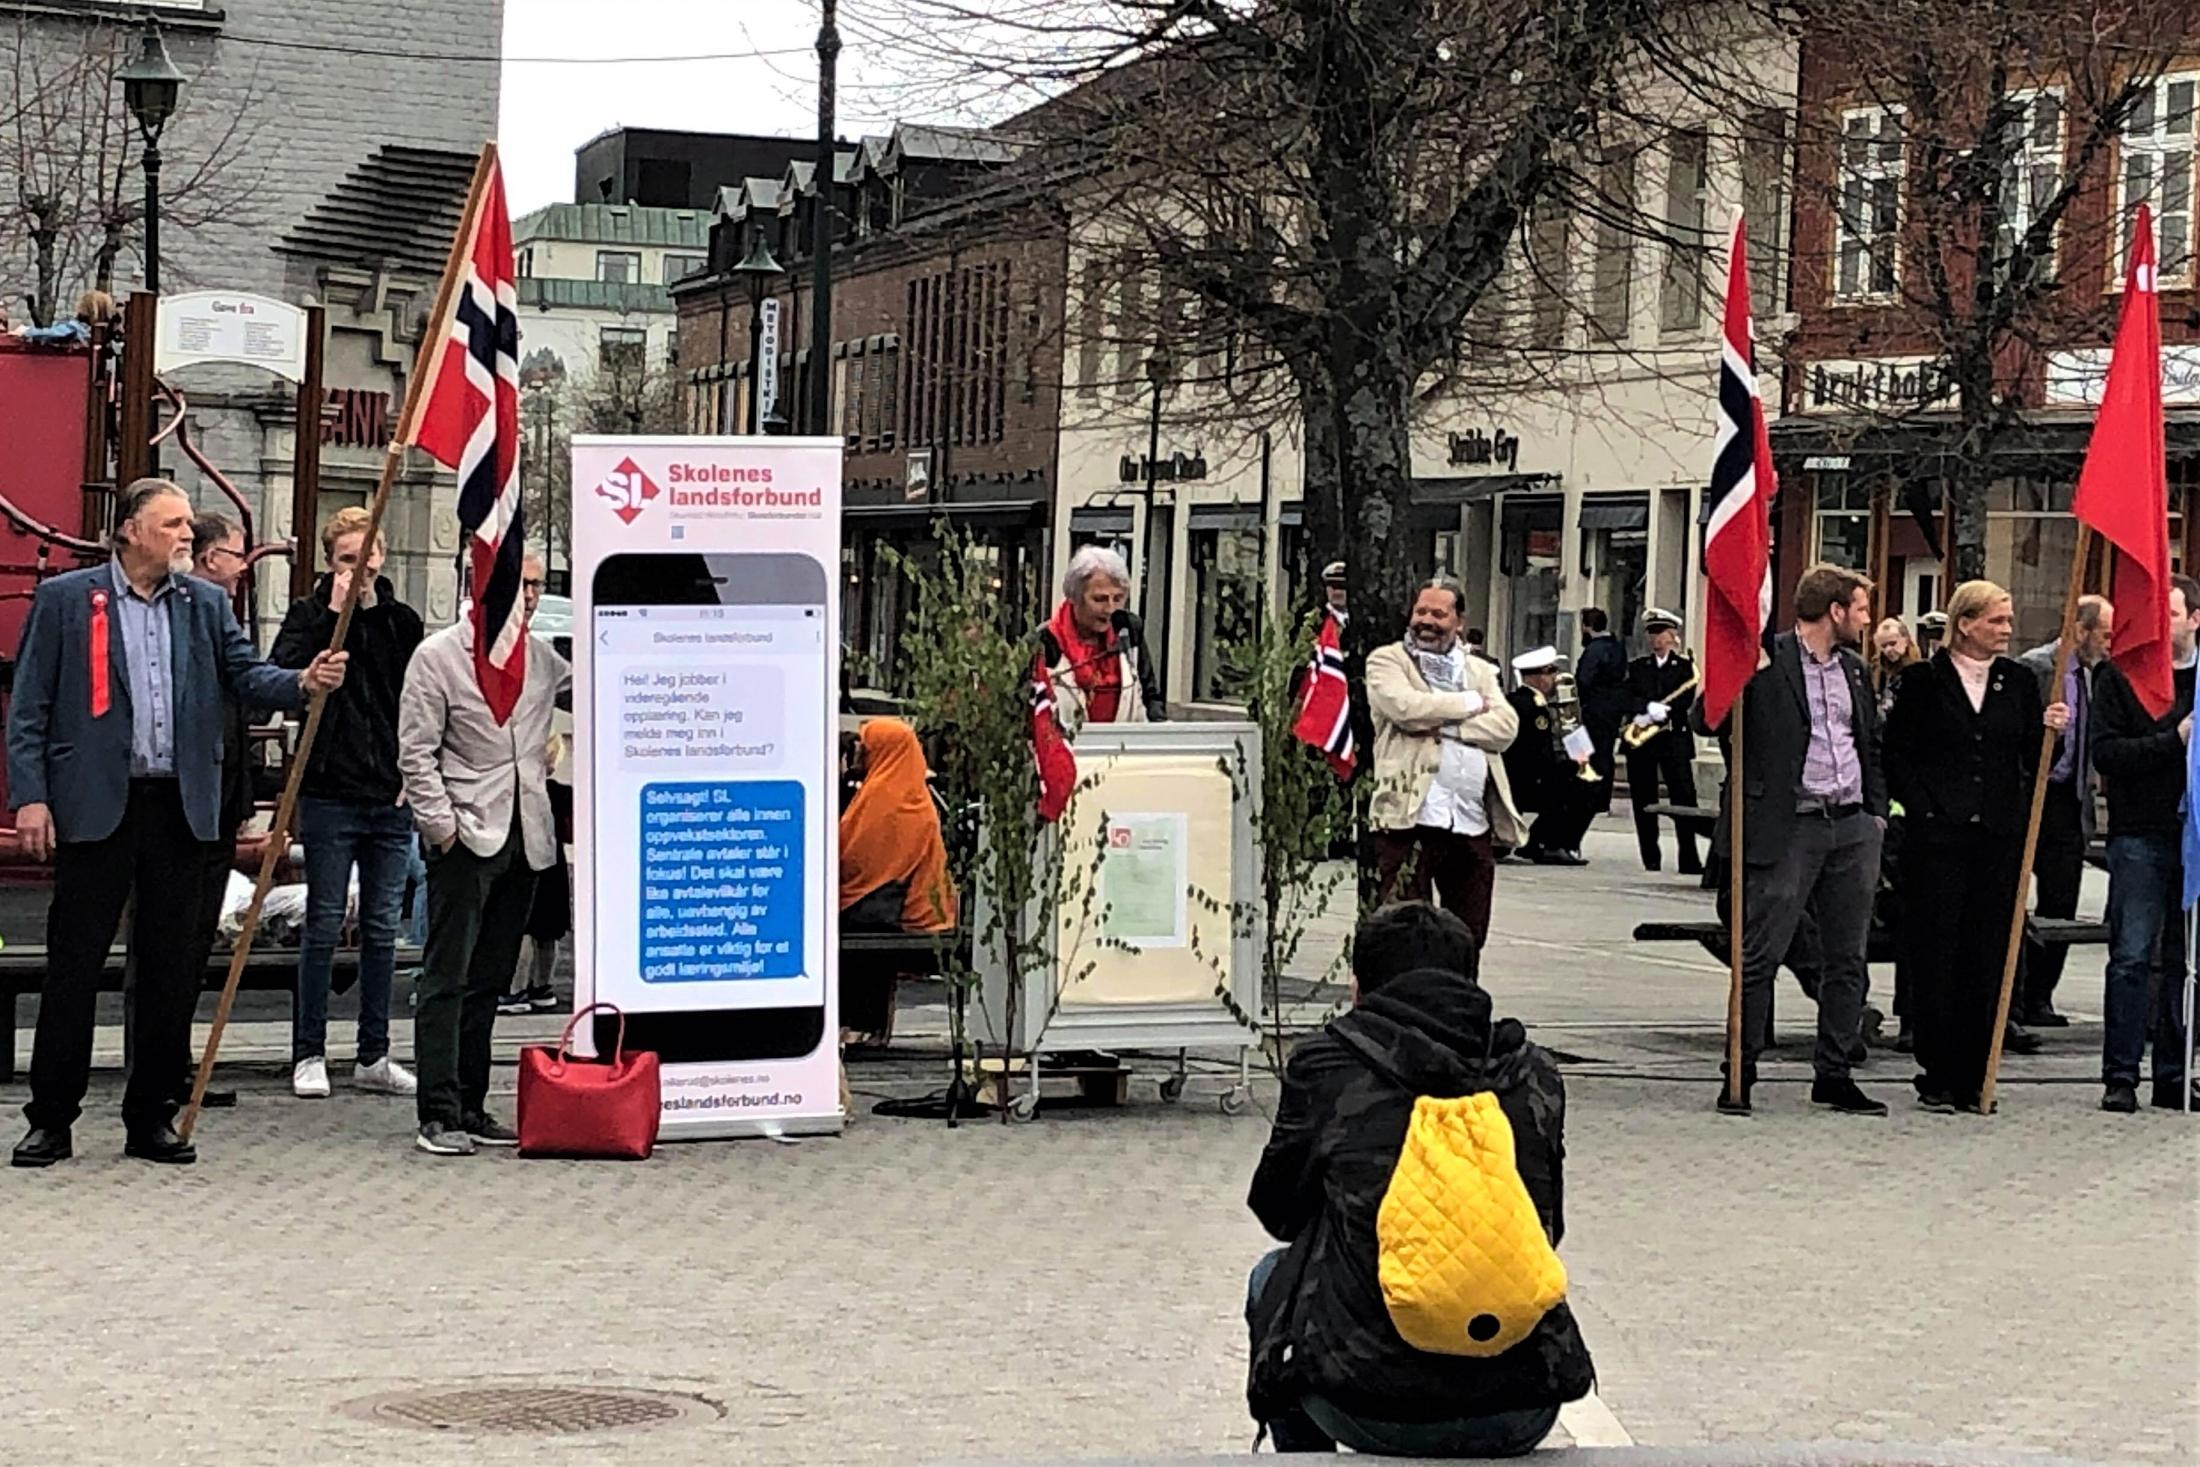 Forbundsleder Anne Finborud har hovedtaler i Hønefoss 1. mai. (Foto: Ståle Skjønhaug)